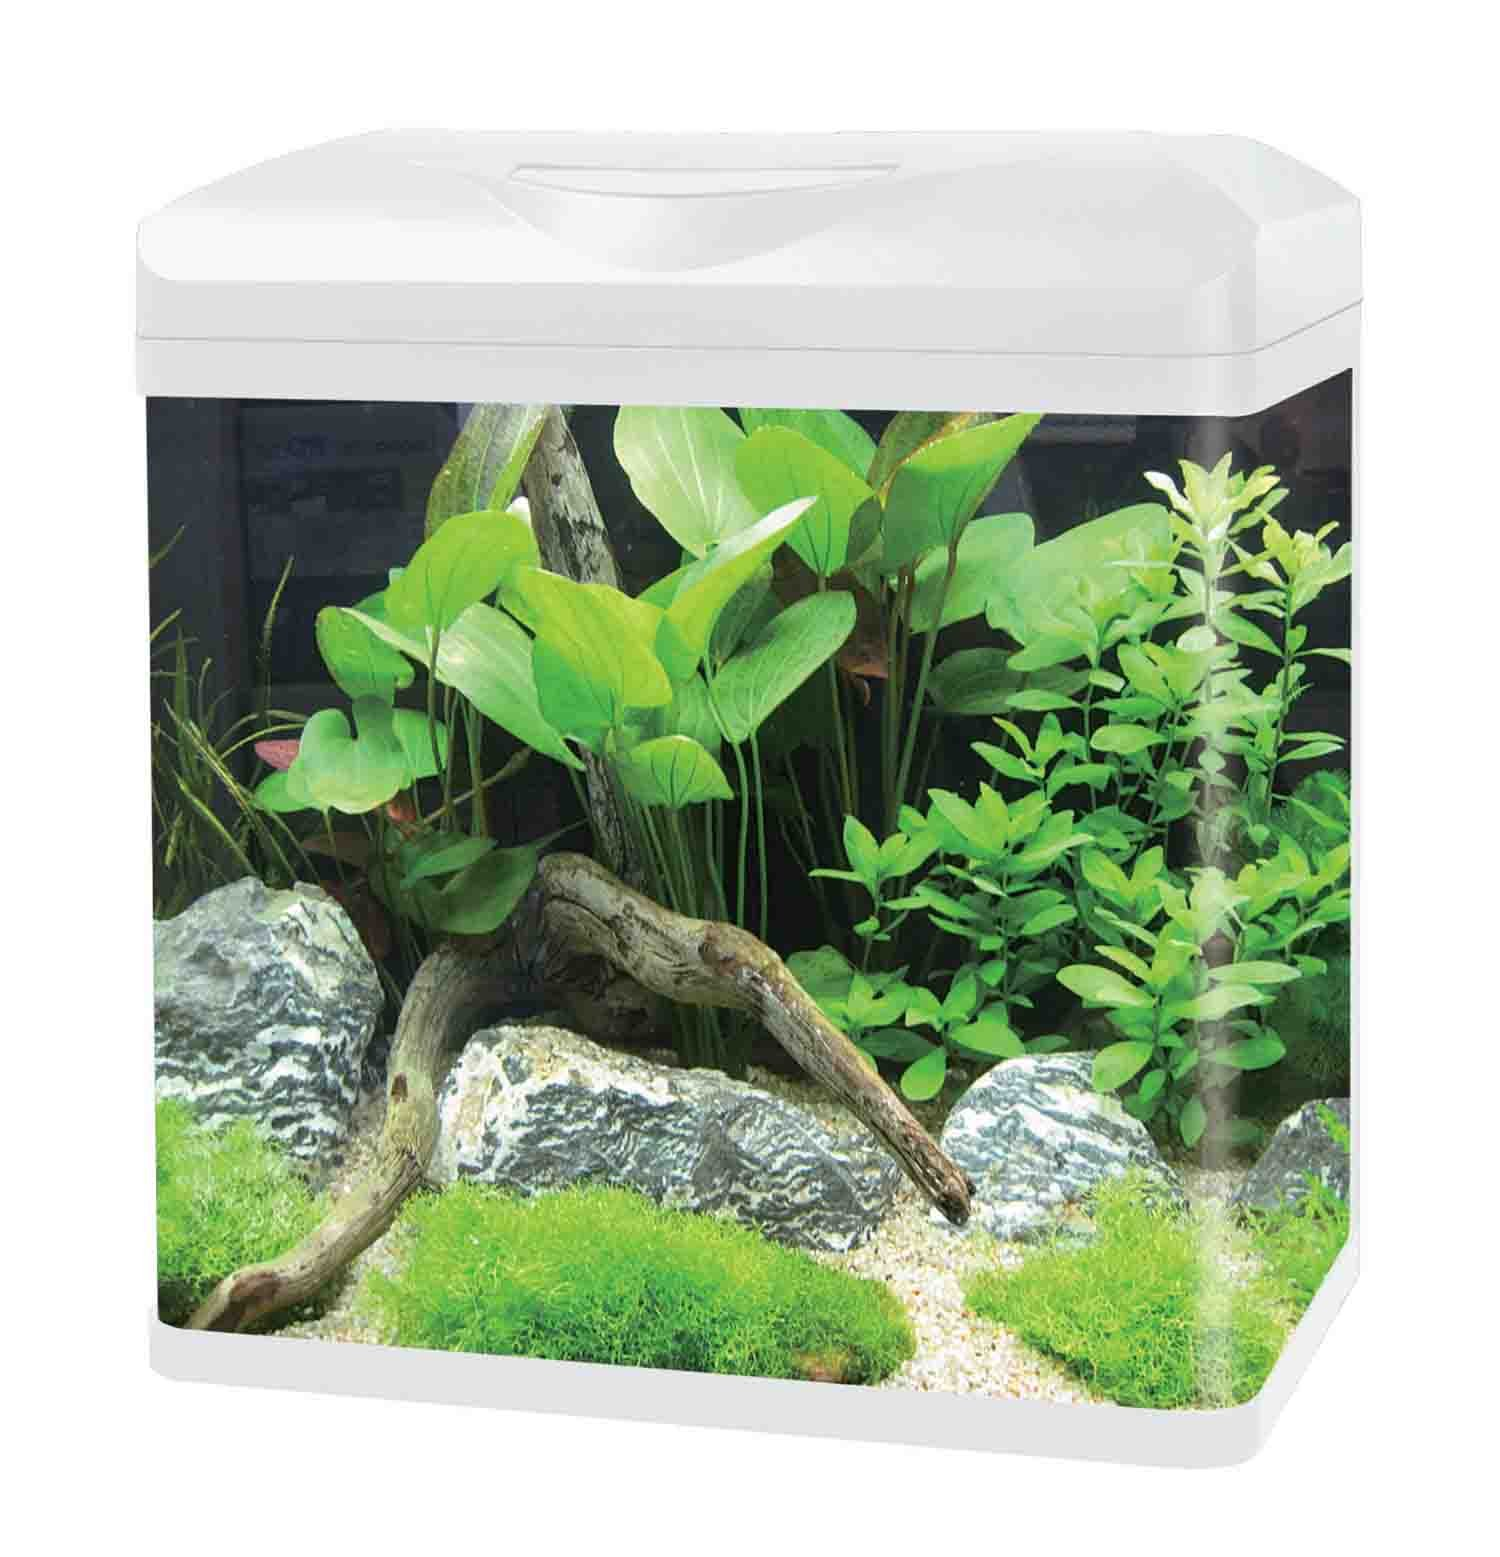 Get Quotations · HAQOS Curved Corner Glass Aquarium E Series